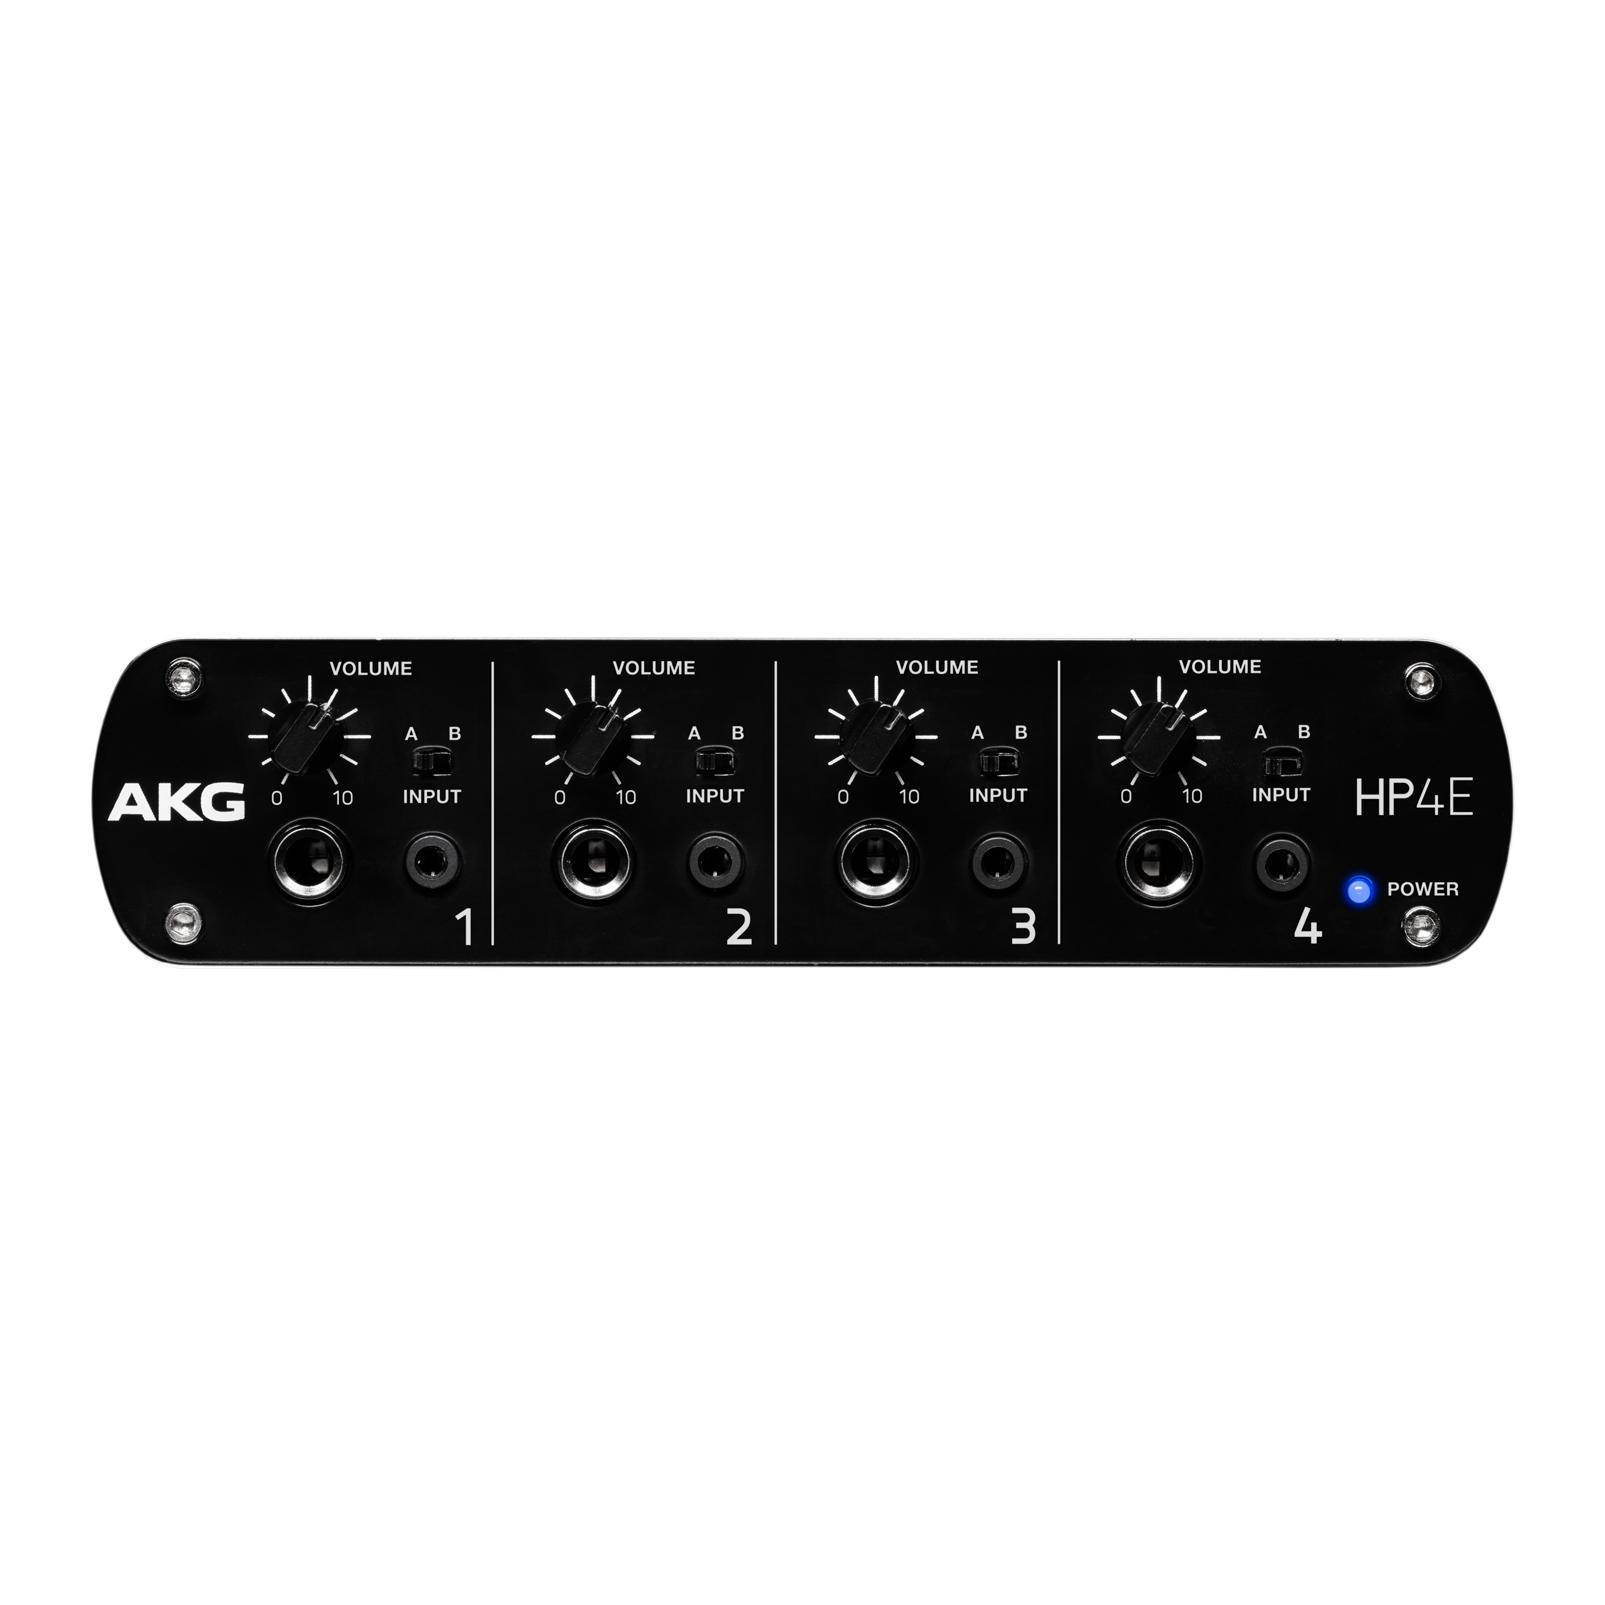 HP4E - Black - 4-channel headphone amplifier - Front